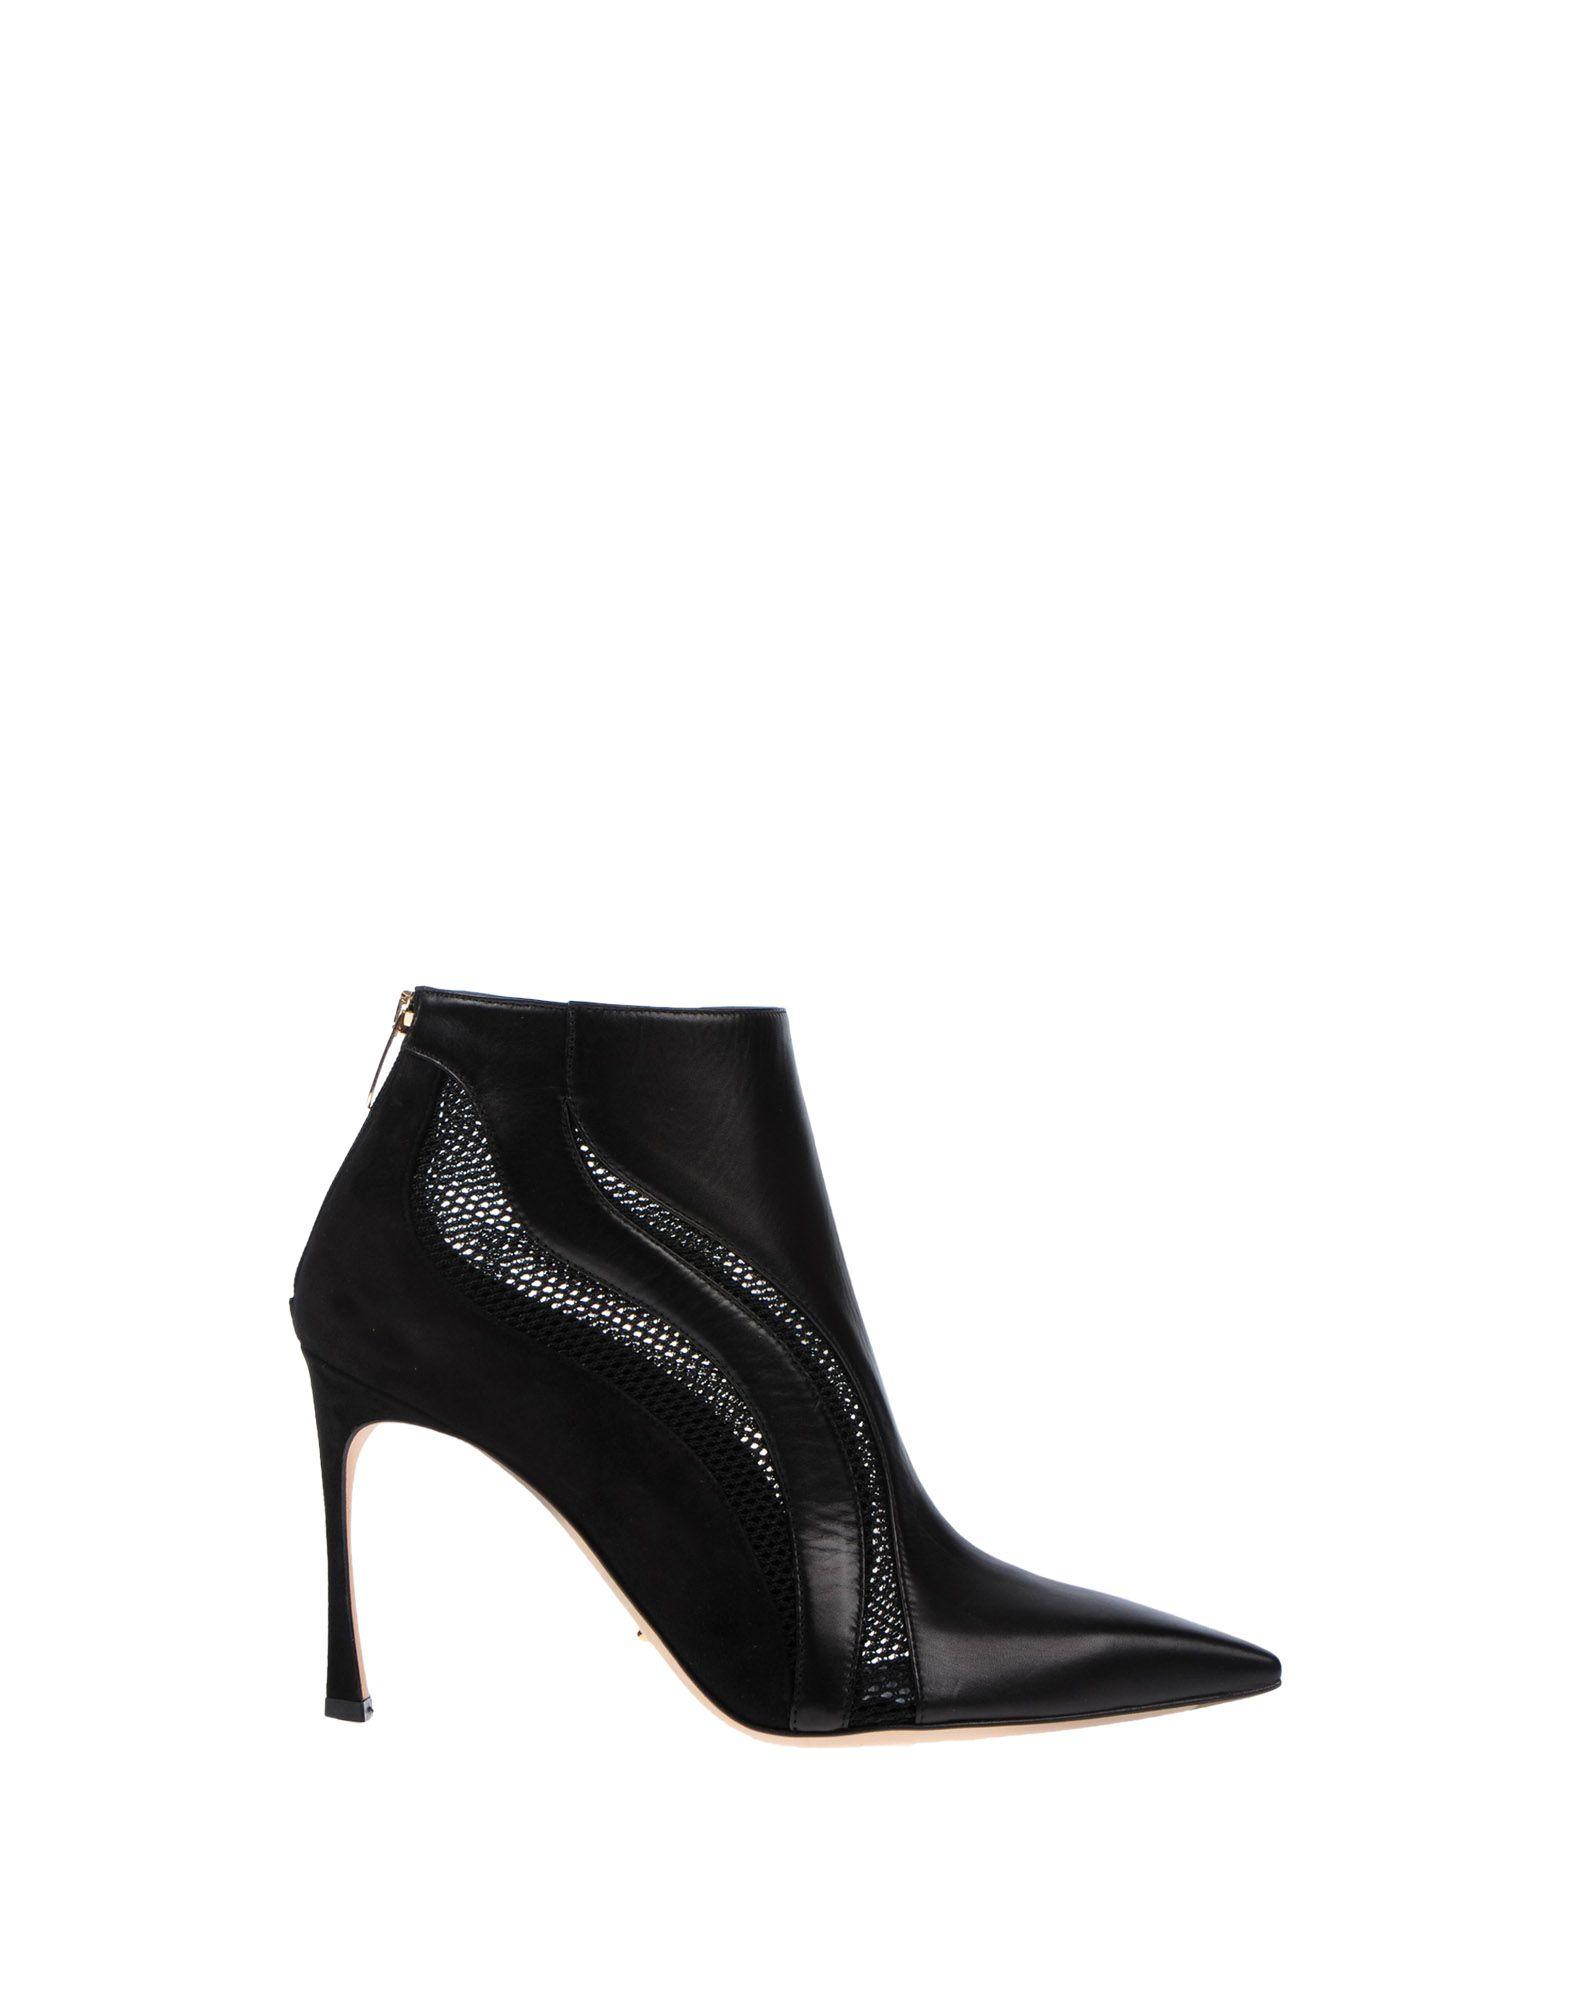 Sergio Rossi Stiefelette Damen  11427805MQ Beliebte Schuhe